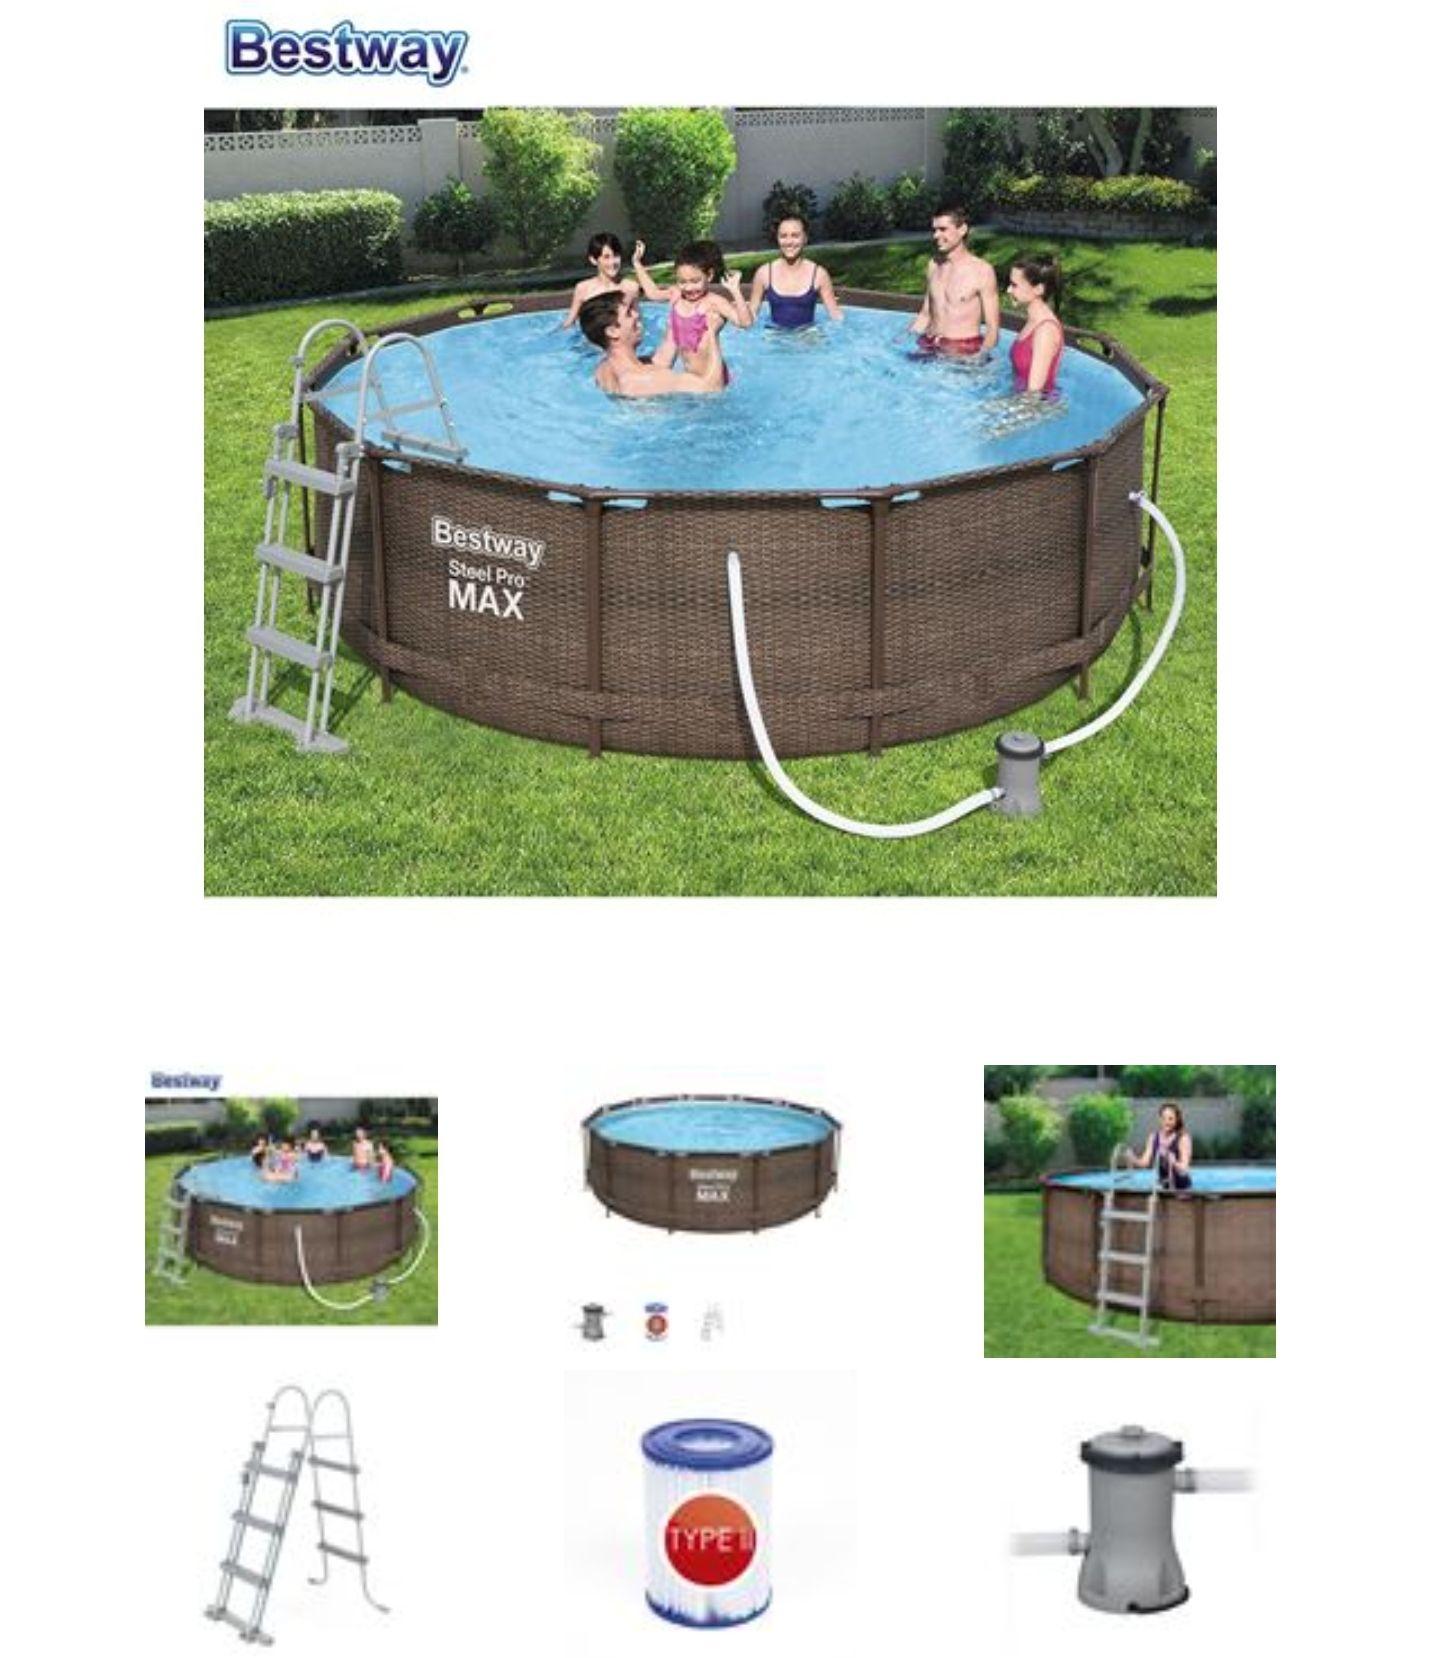 Bestway #56709 Steel Pro MAX Pool 366x100cm